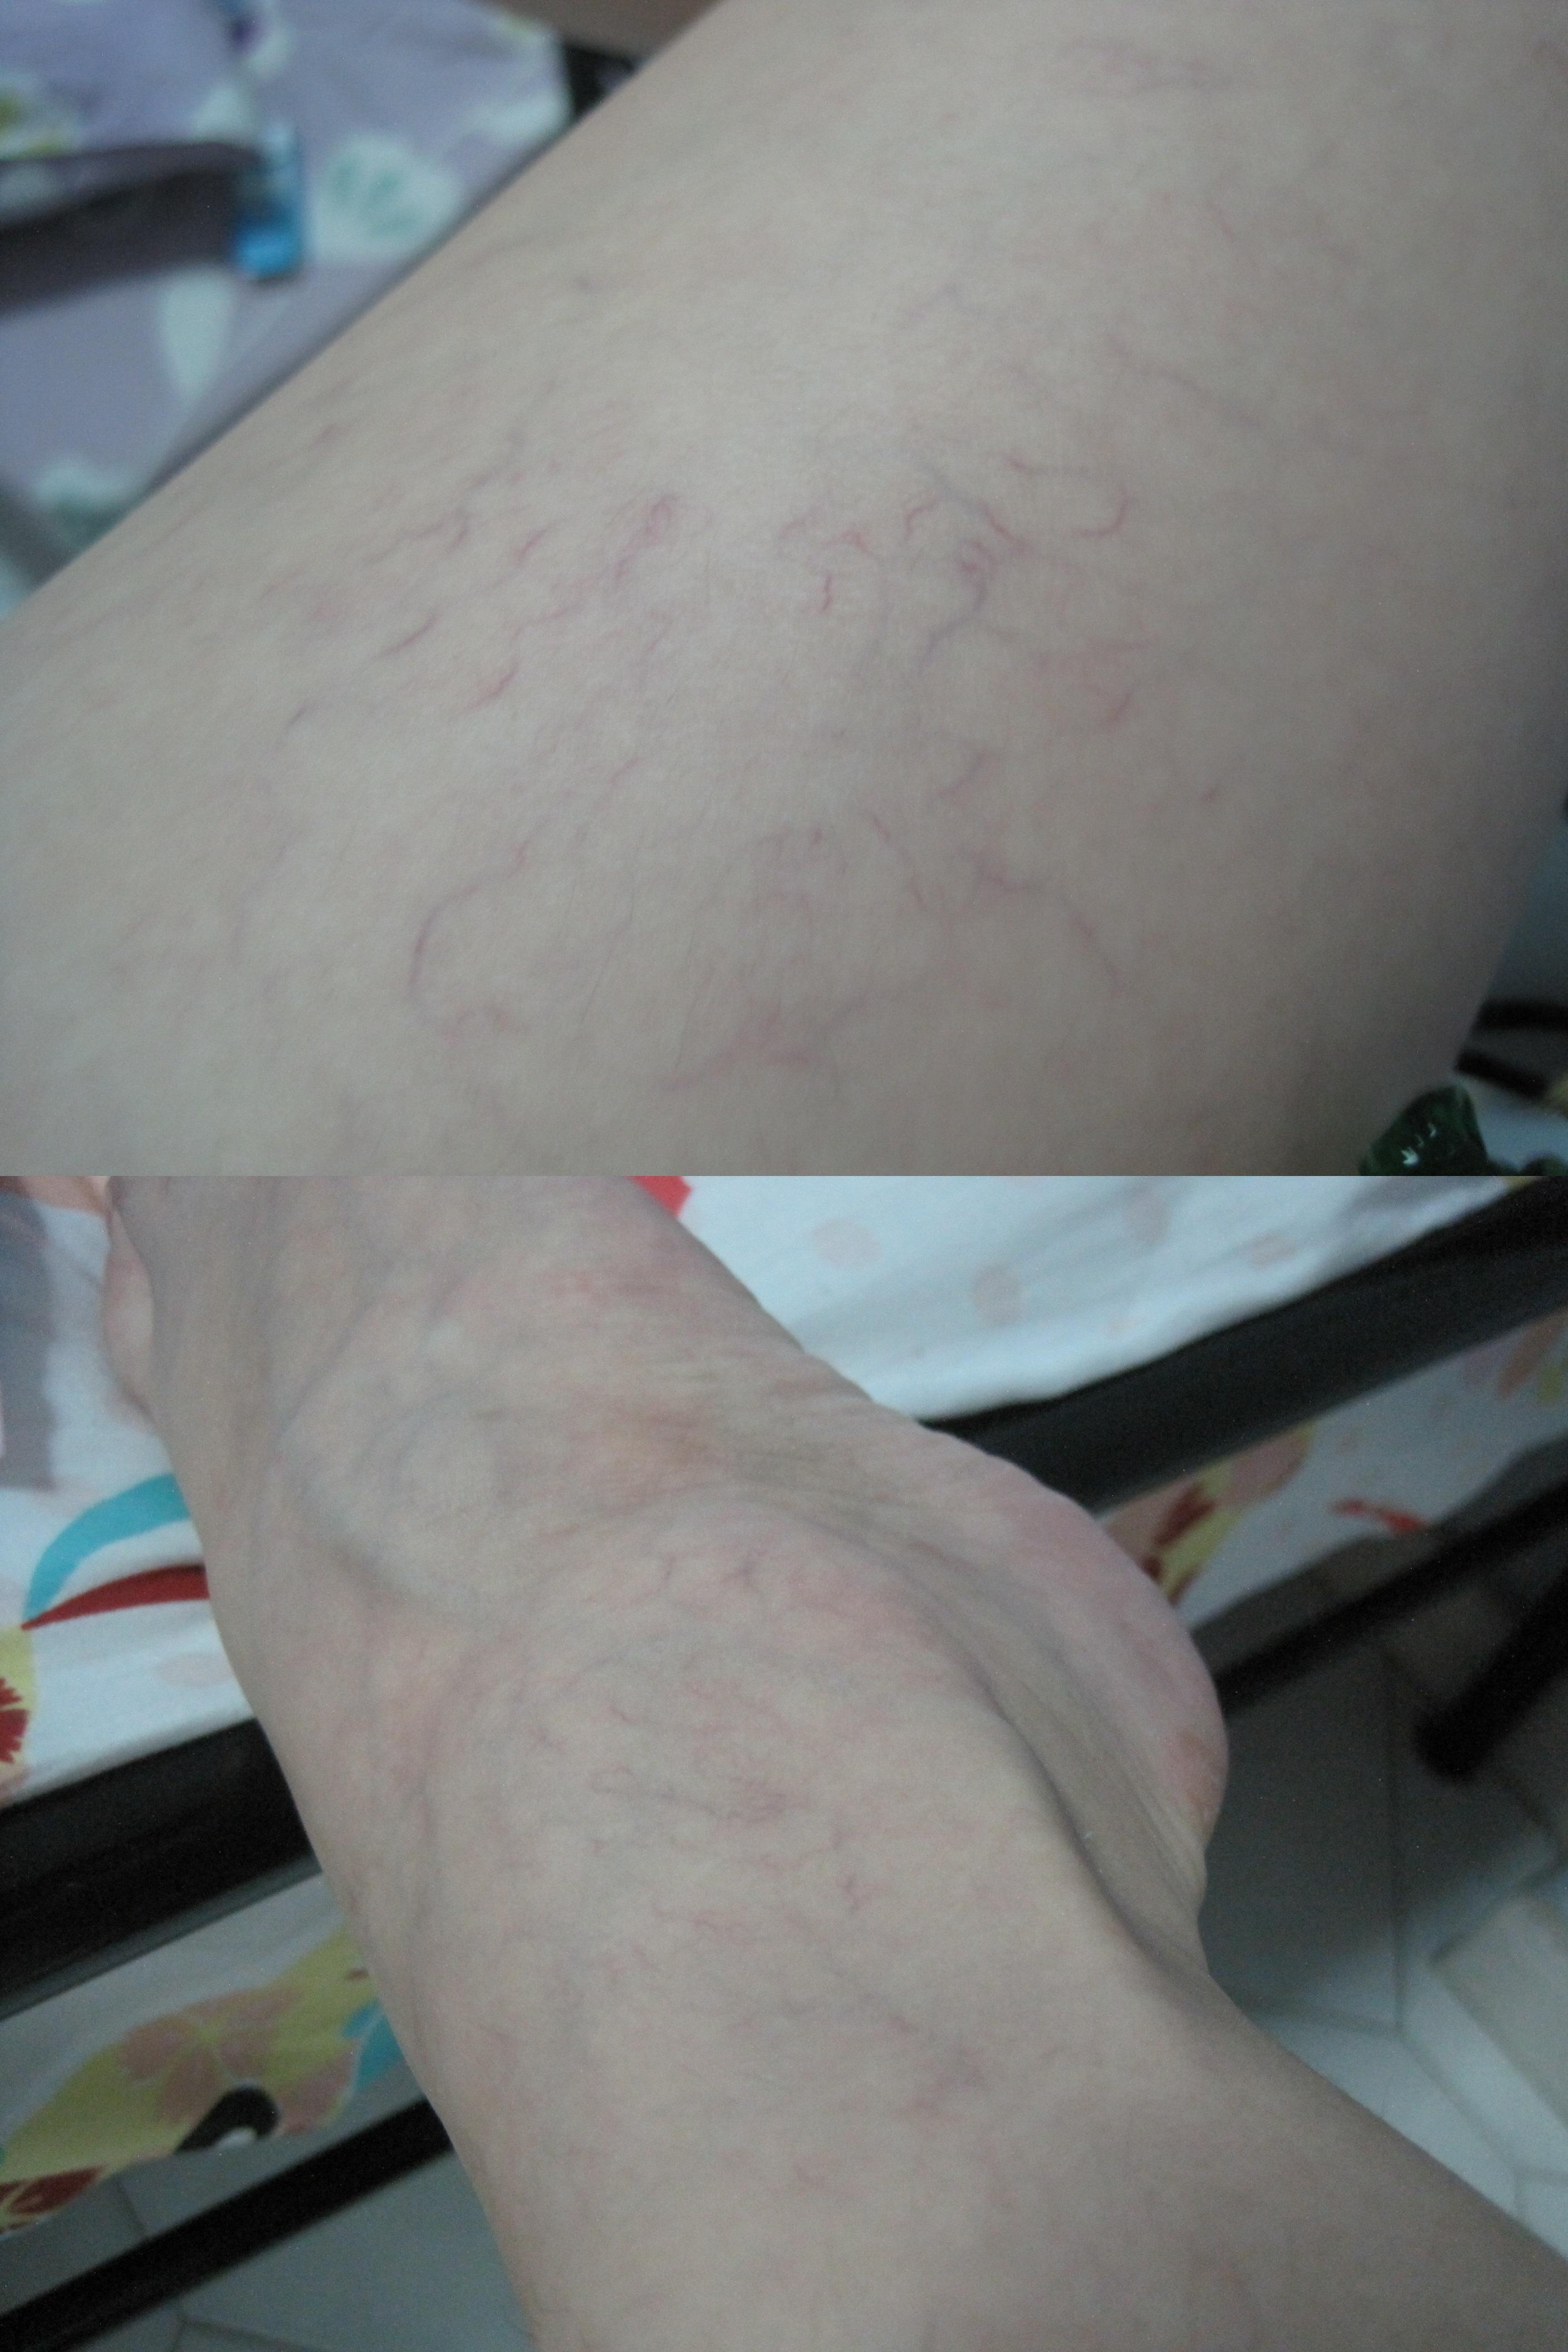 ea5d1e3037fc3e Scholl Sleeping Leggings: battle with cellulite + spider veins ...